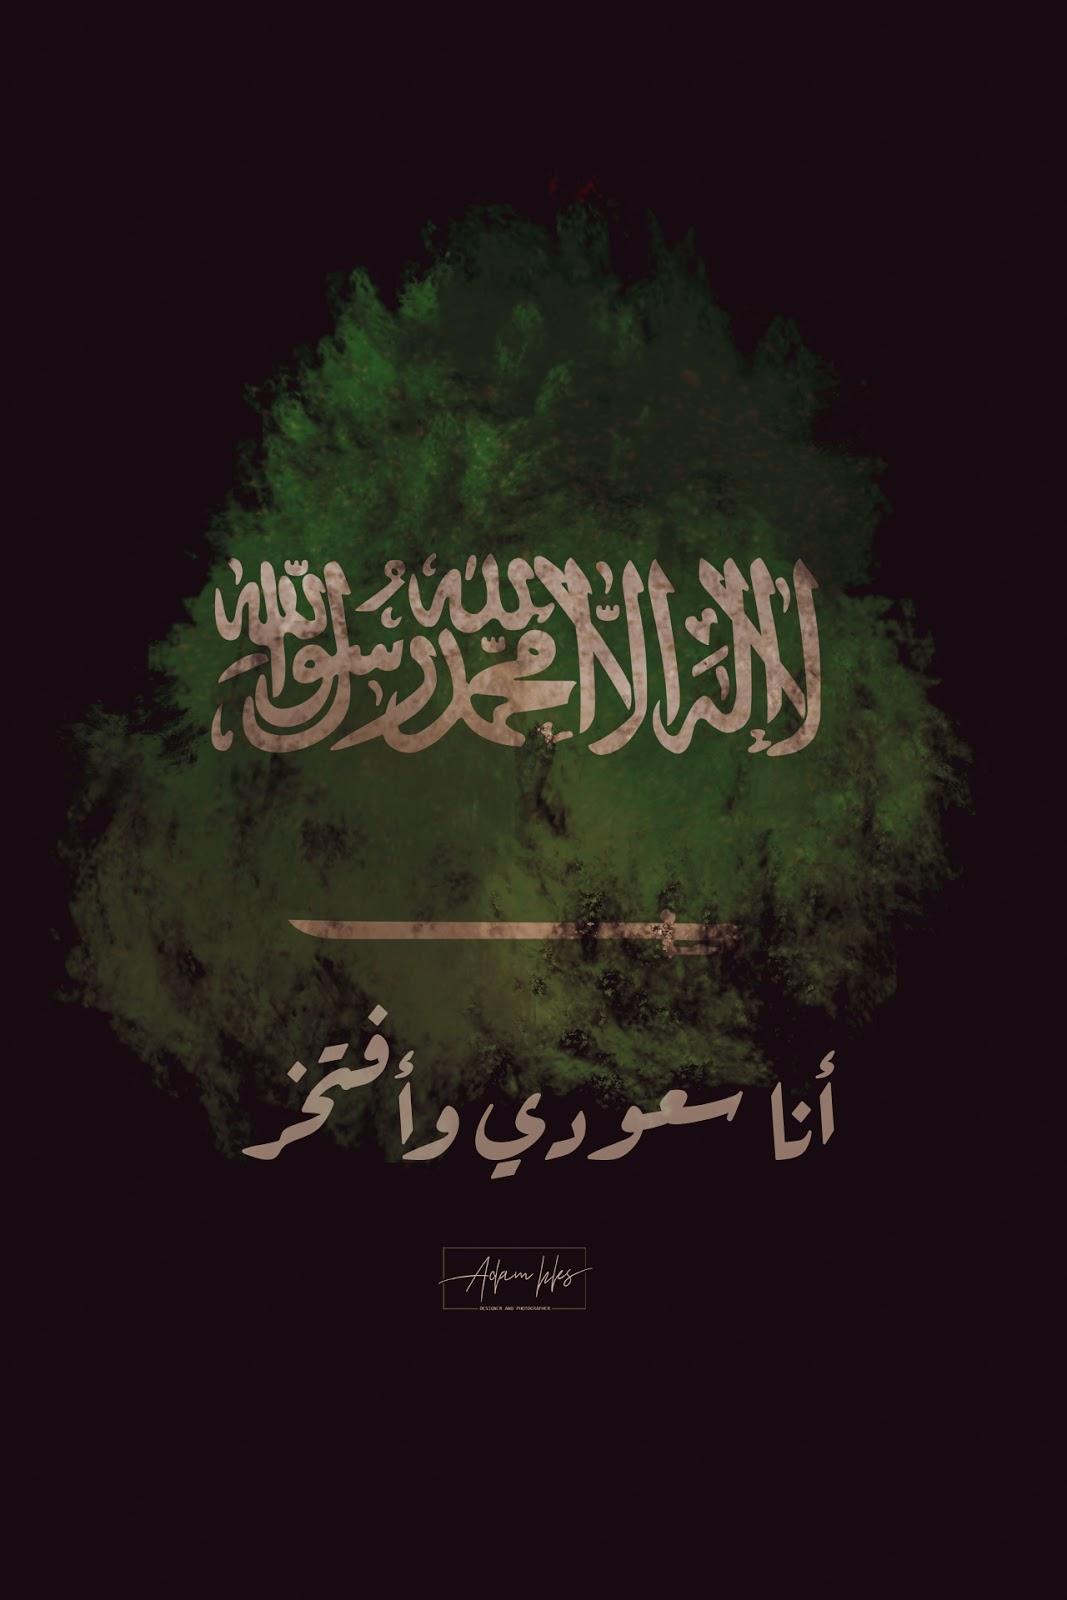 أنا سعودي وأفتخر